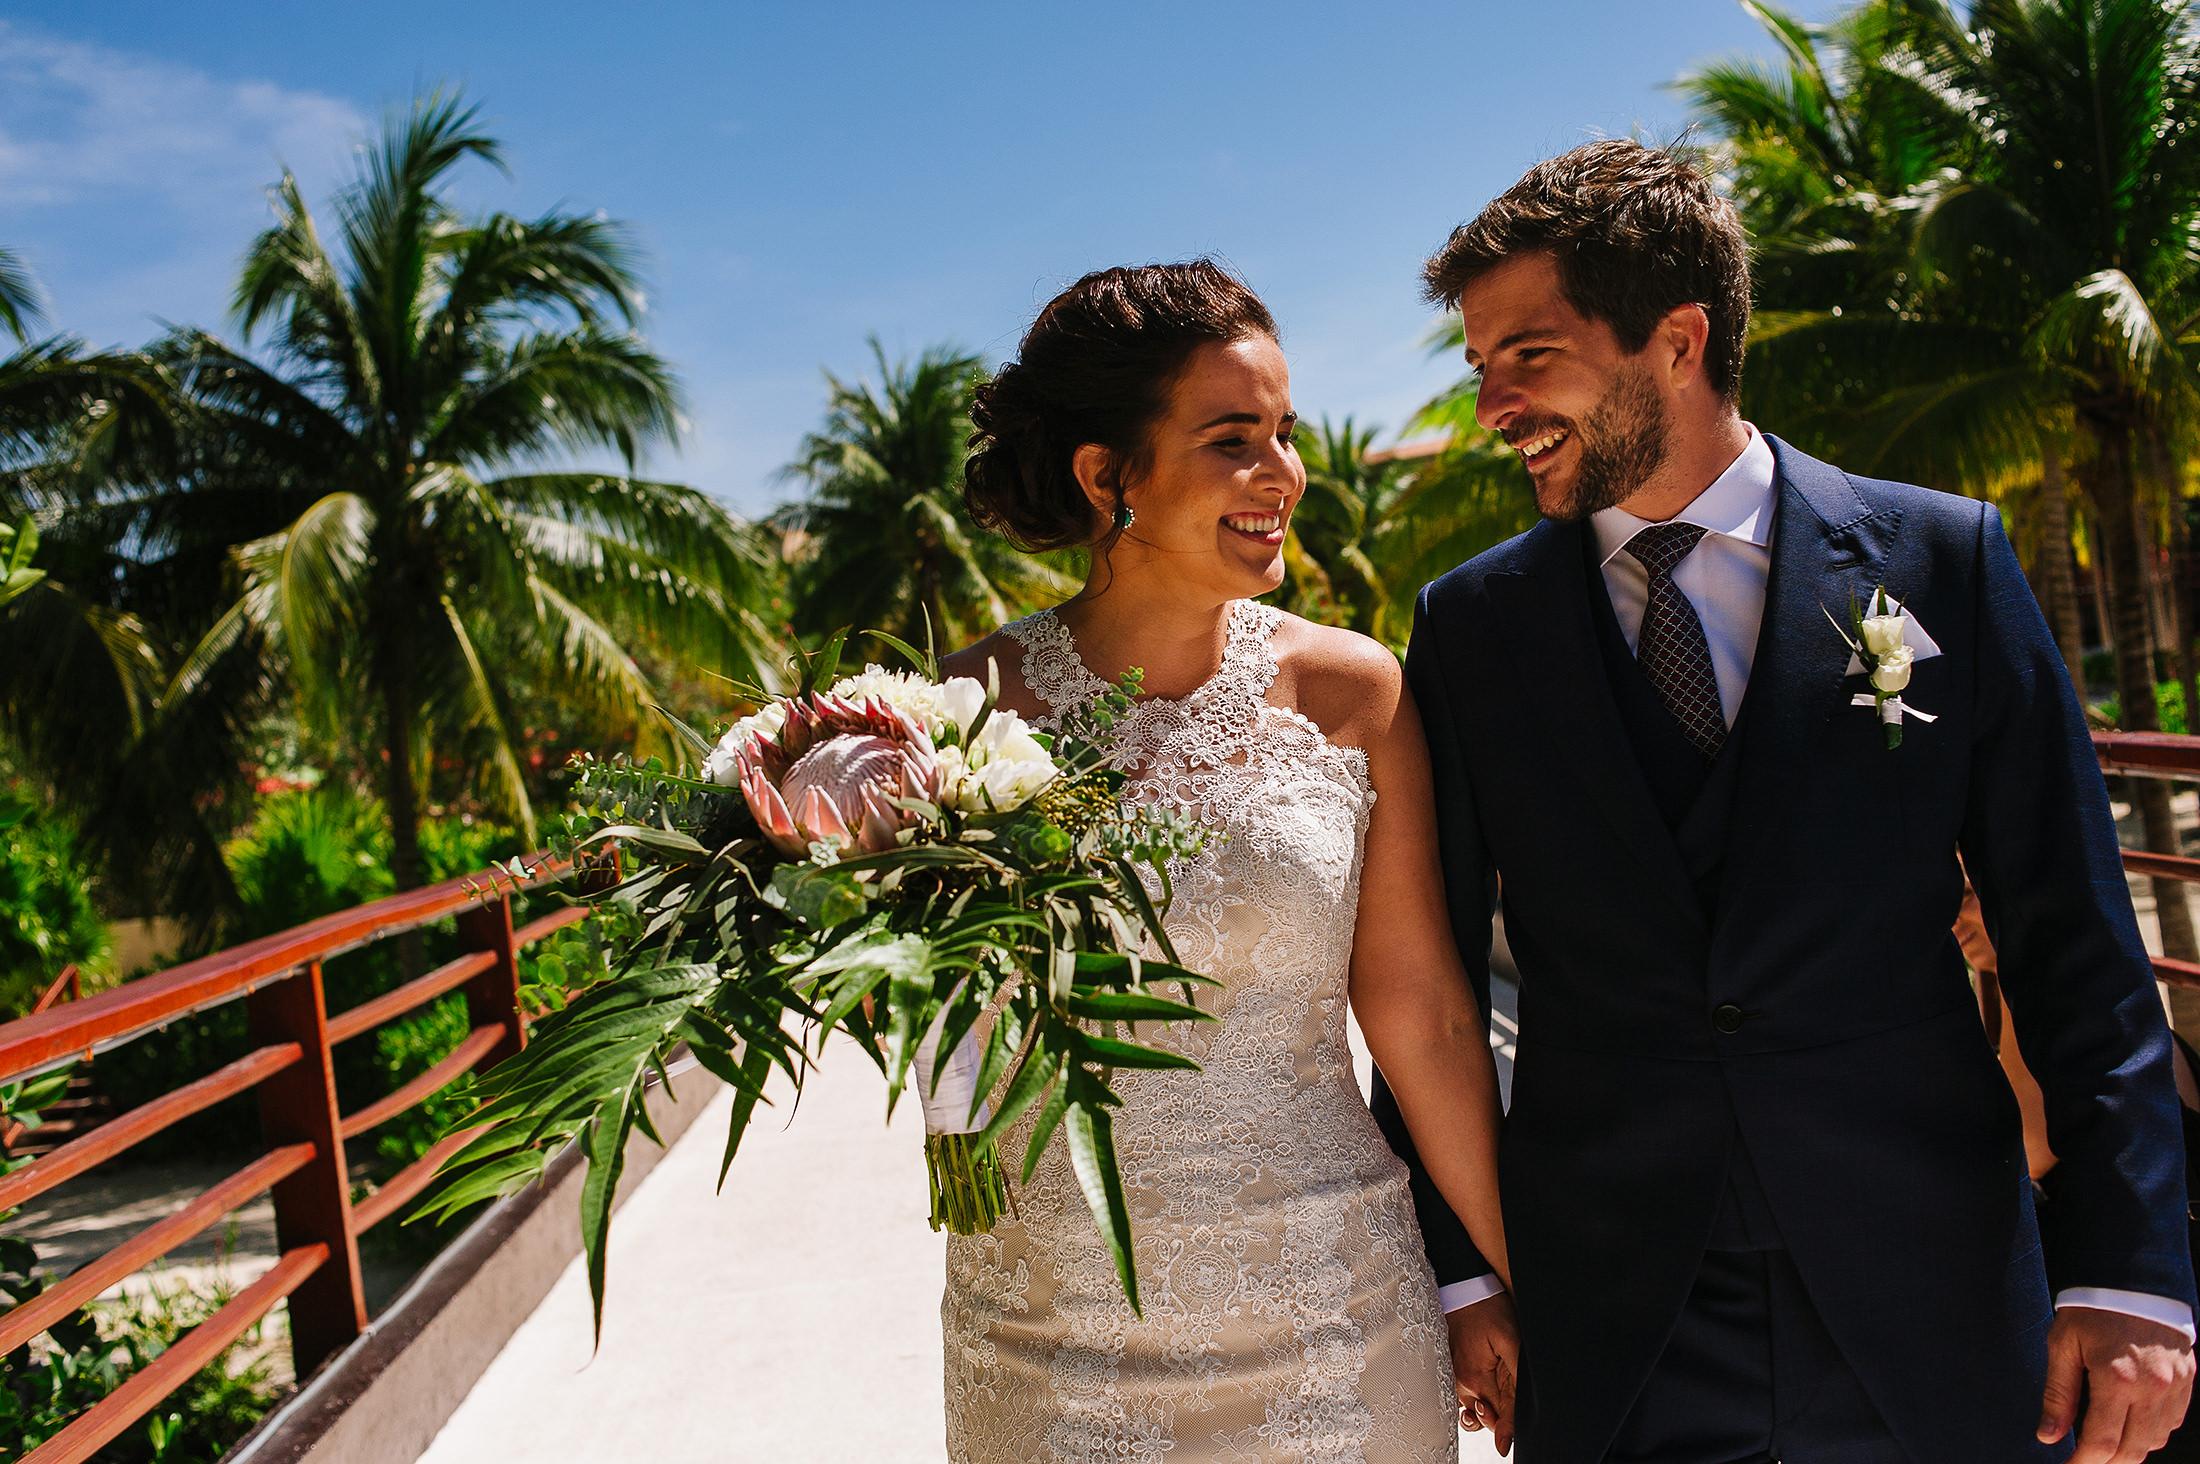 Bride and groom walking on the paths of Hacienda Tres Rios